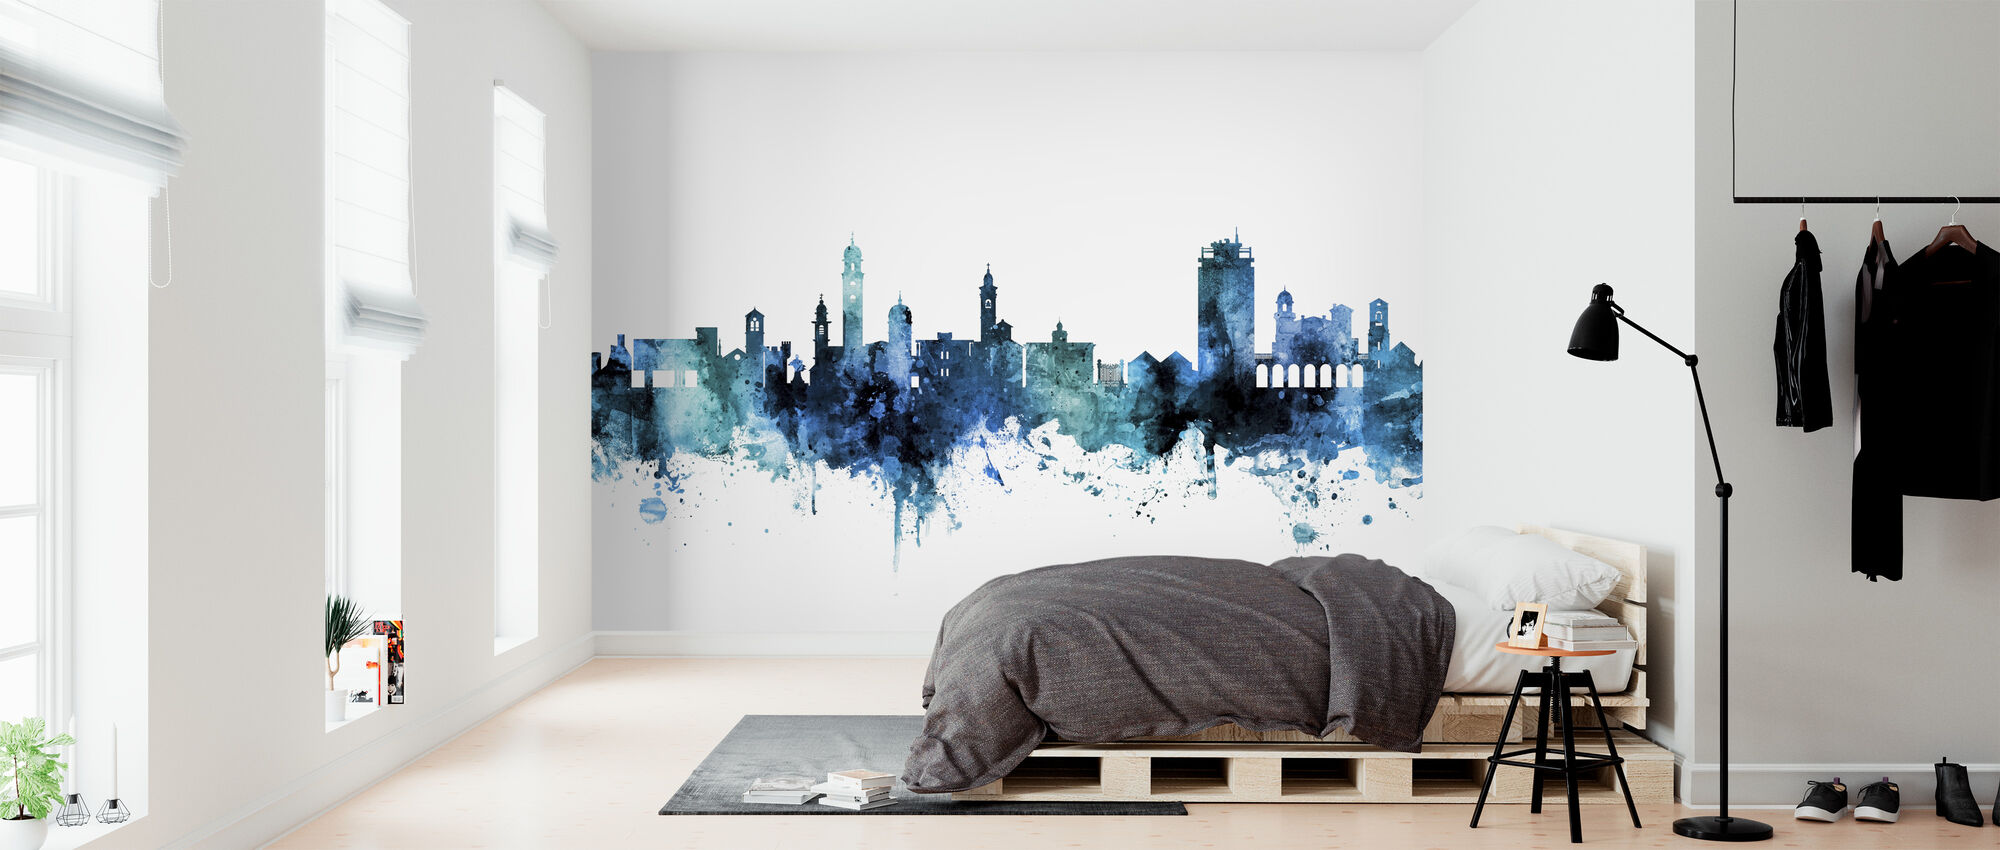 Lugano Switzerland Skyline - Wallpaper - Bedroom